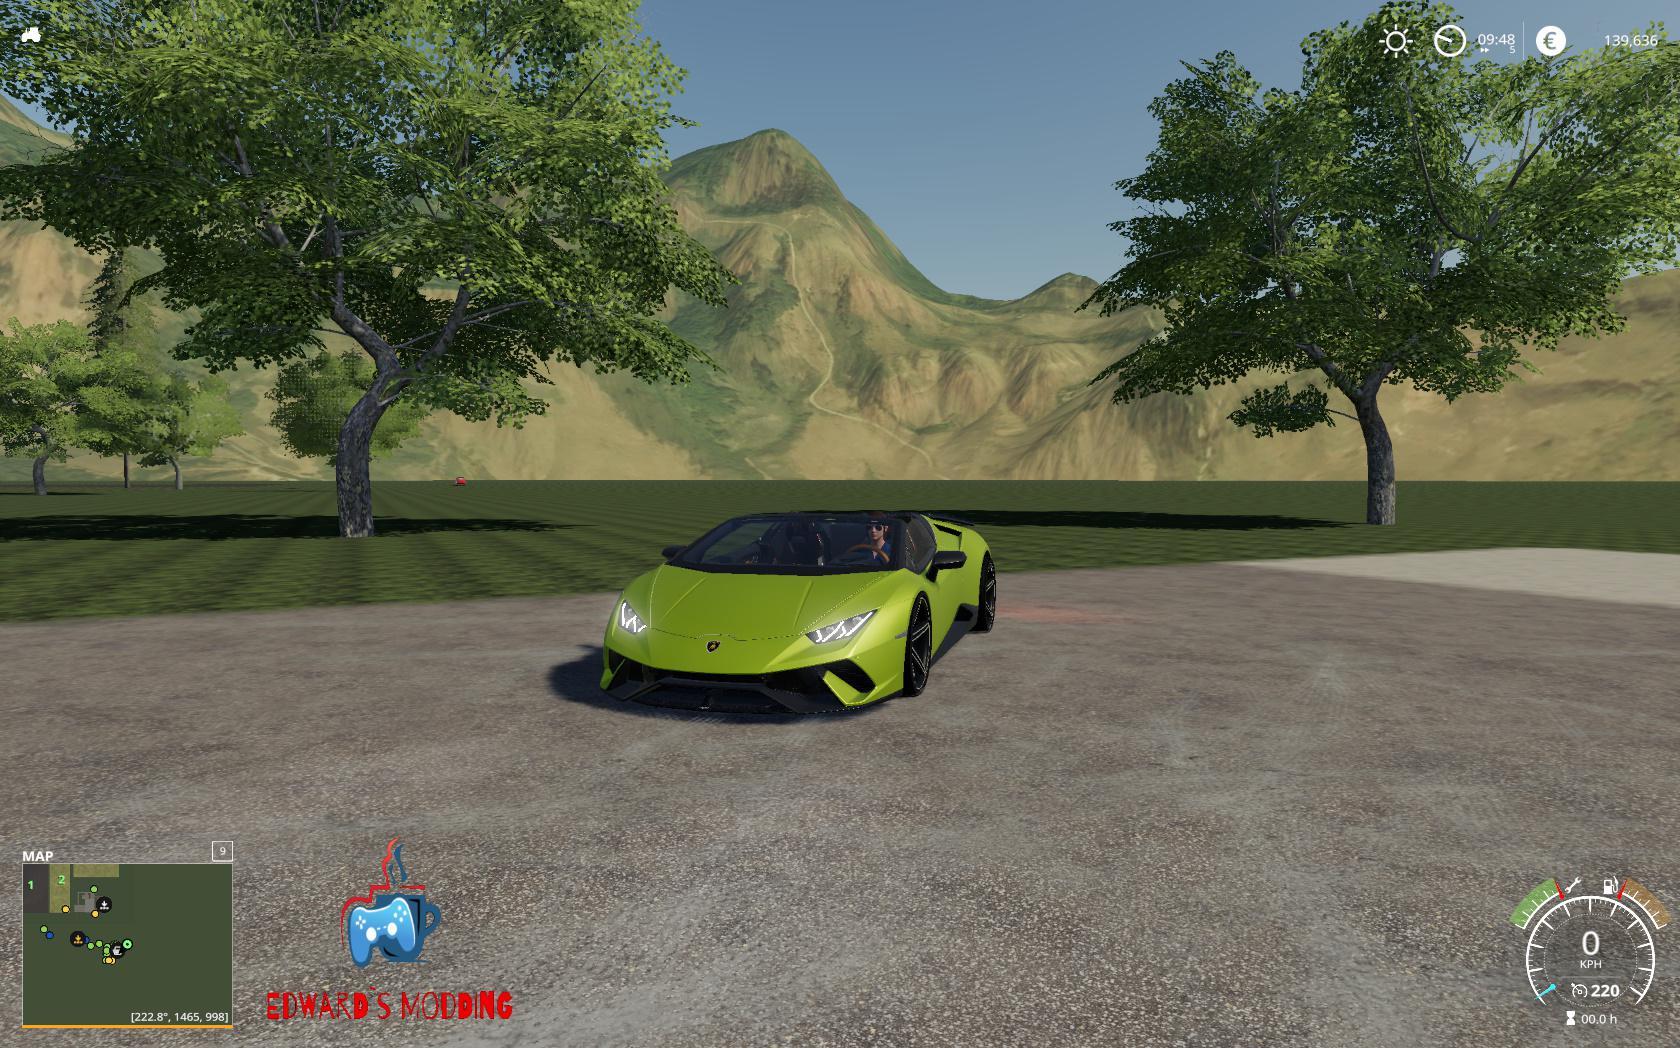 Huracan Spyde Fs19 v1 0 FS19 - Farming Simulator 19 Mod | FS19 mod